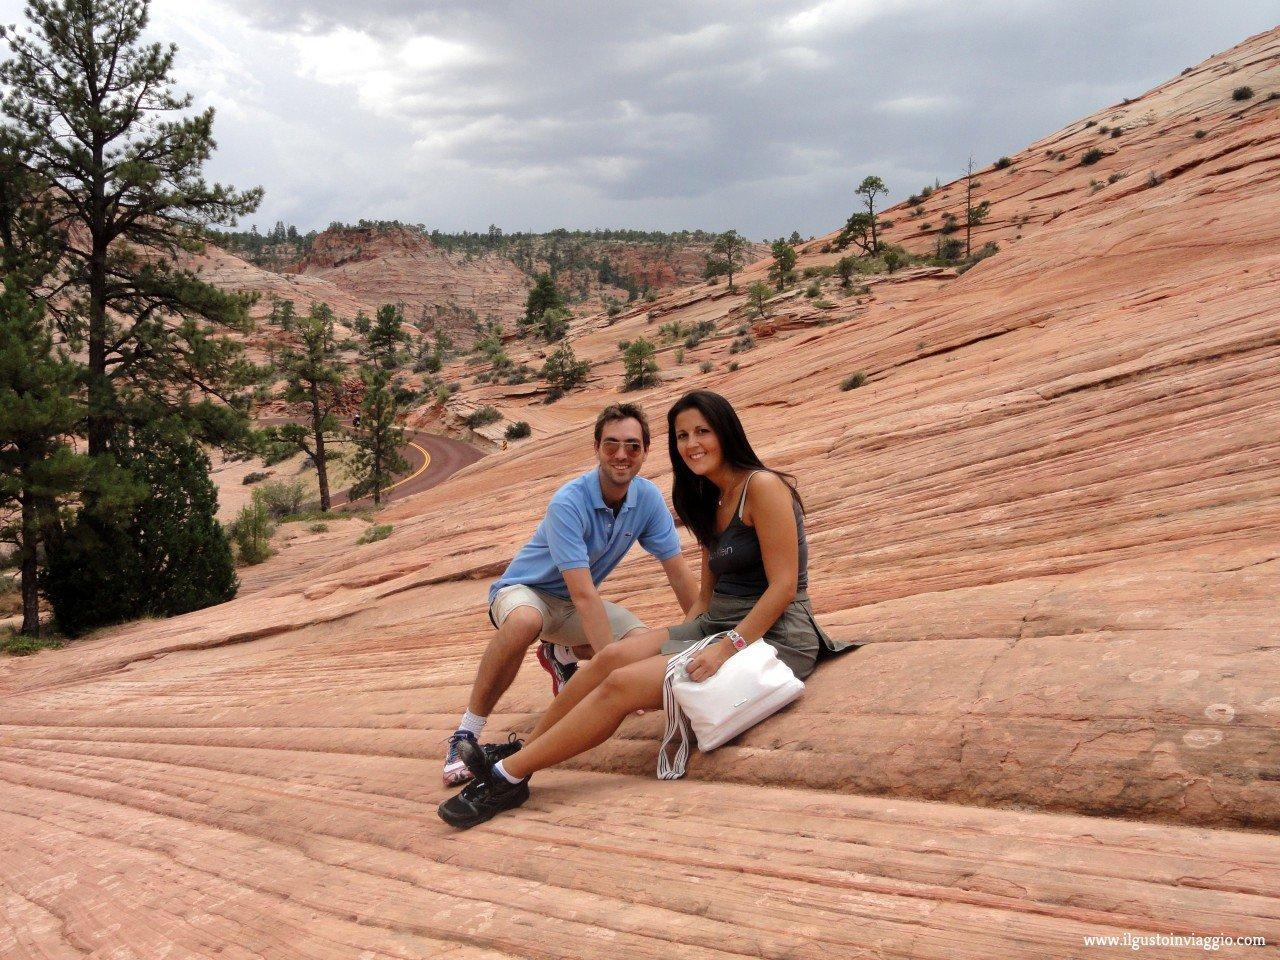 visitare lo zion canyon national park, zion utah